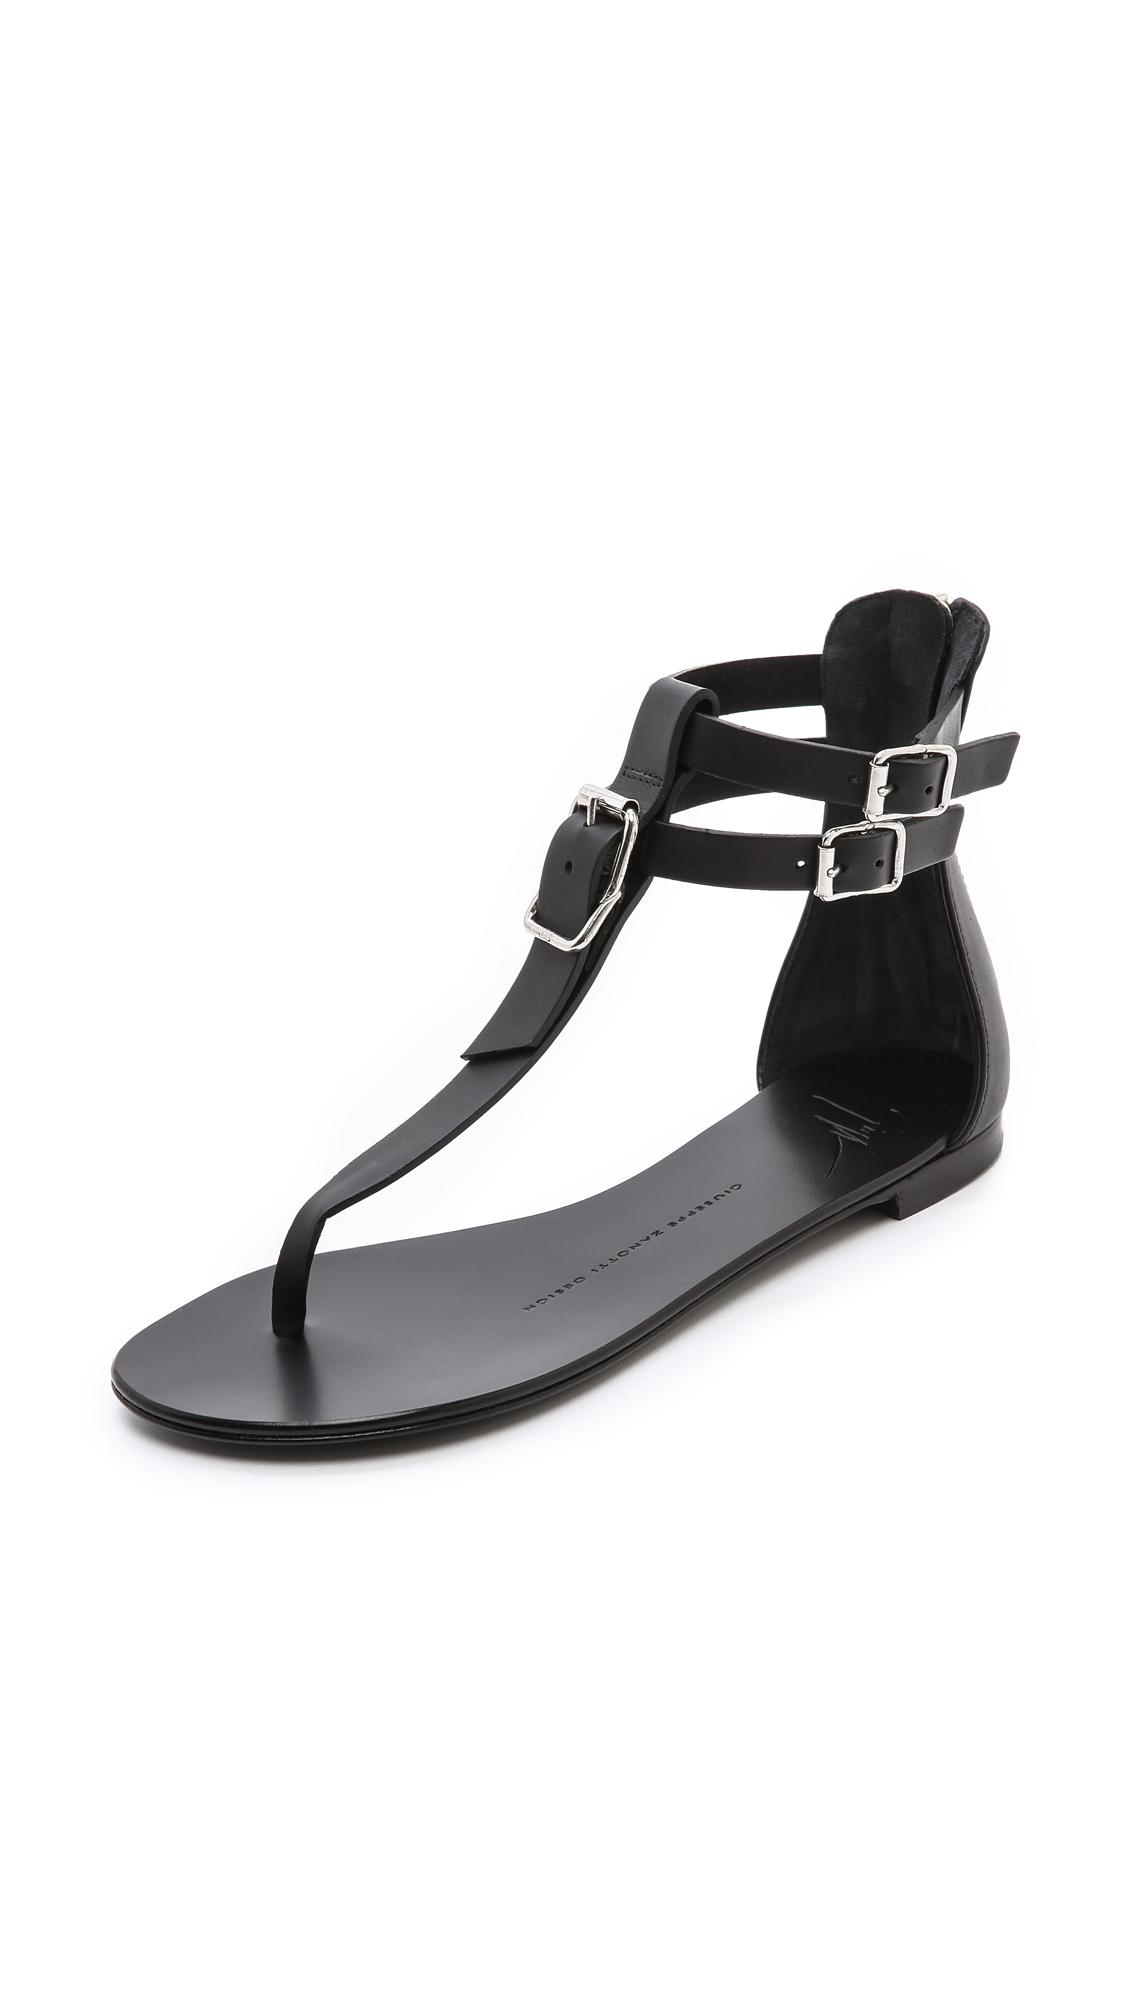 Giuseppe Zanotti Flat T Strap Sandals In Black | Lyst